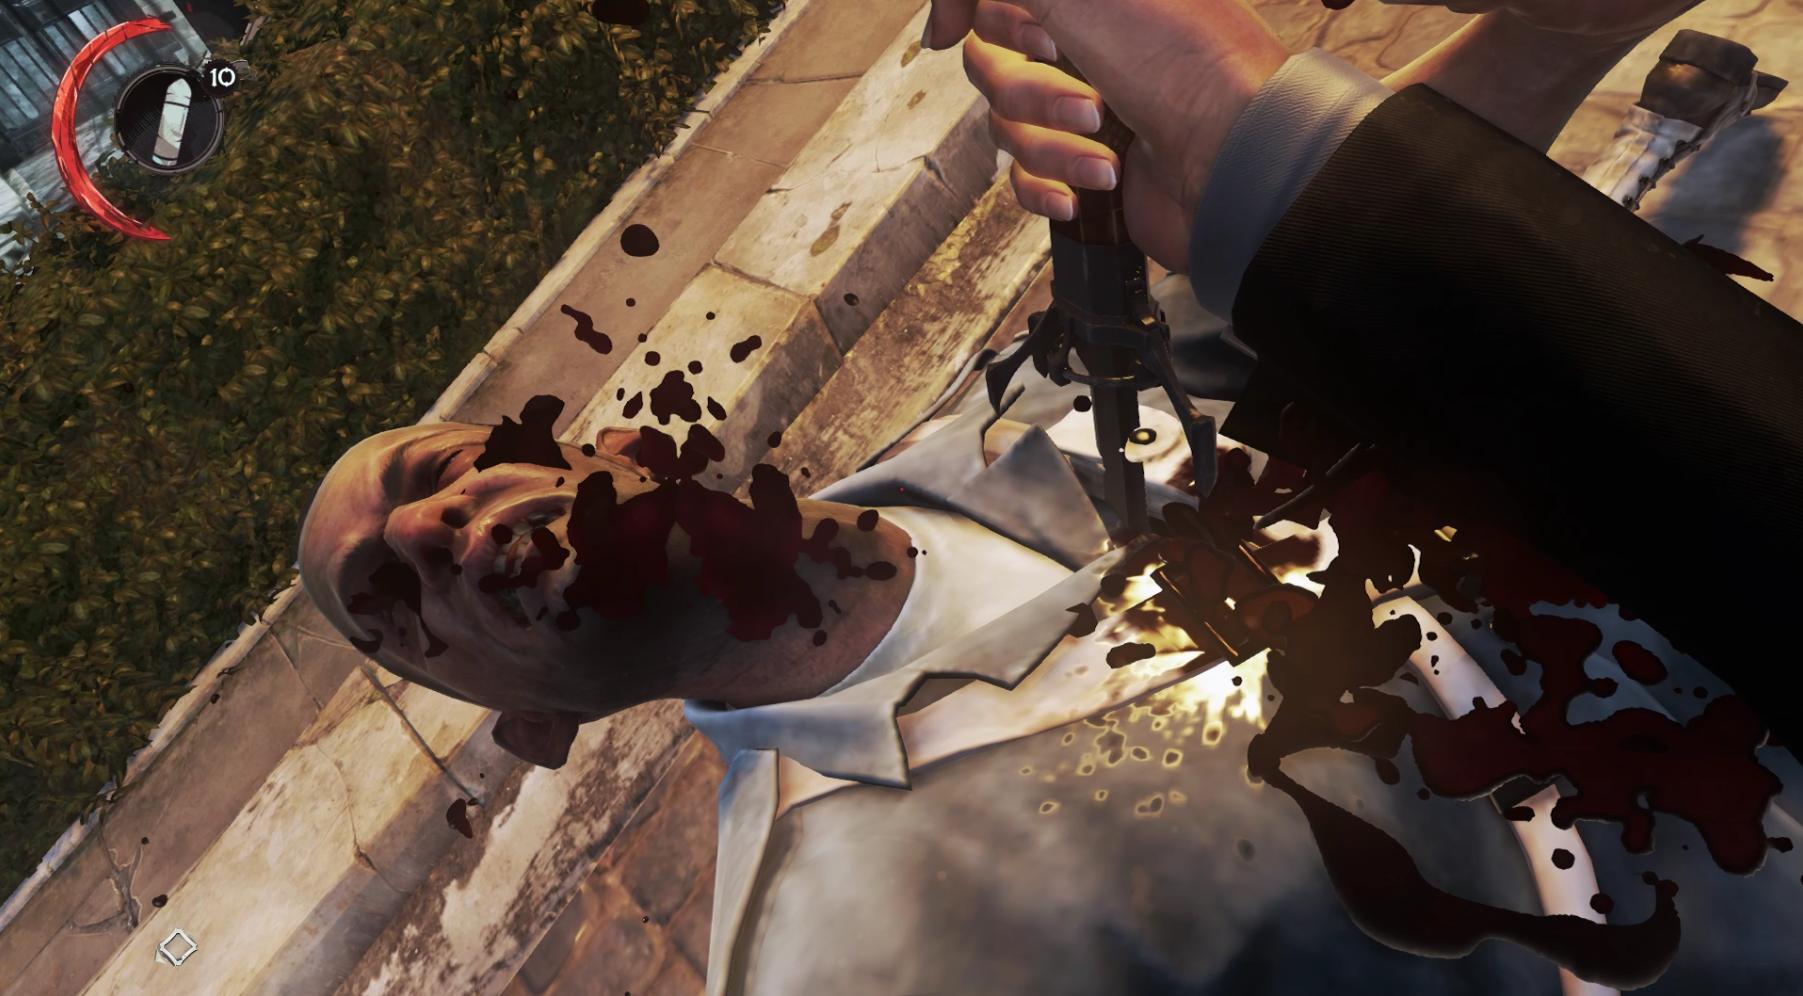 Tuer des ennemis | Dishonored 2